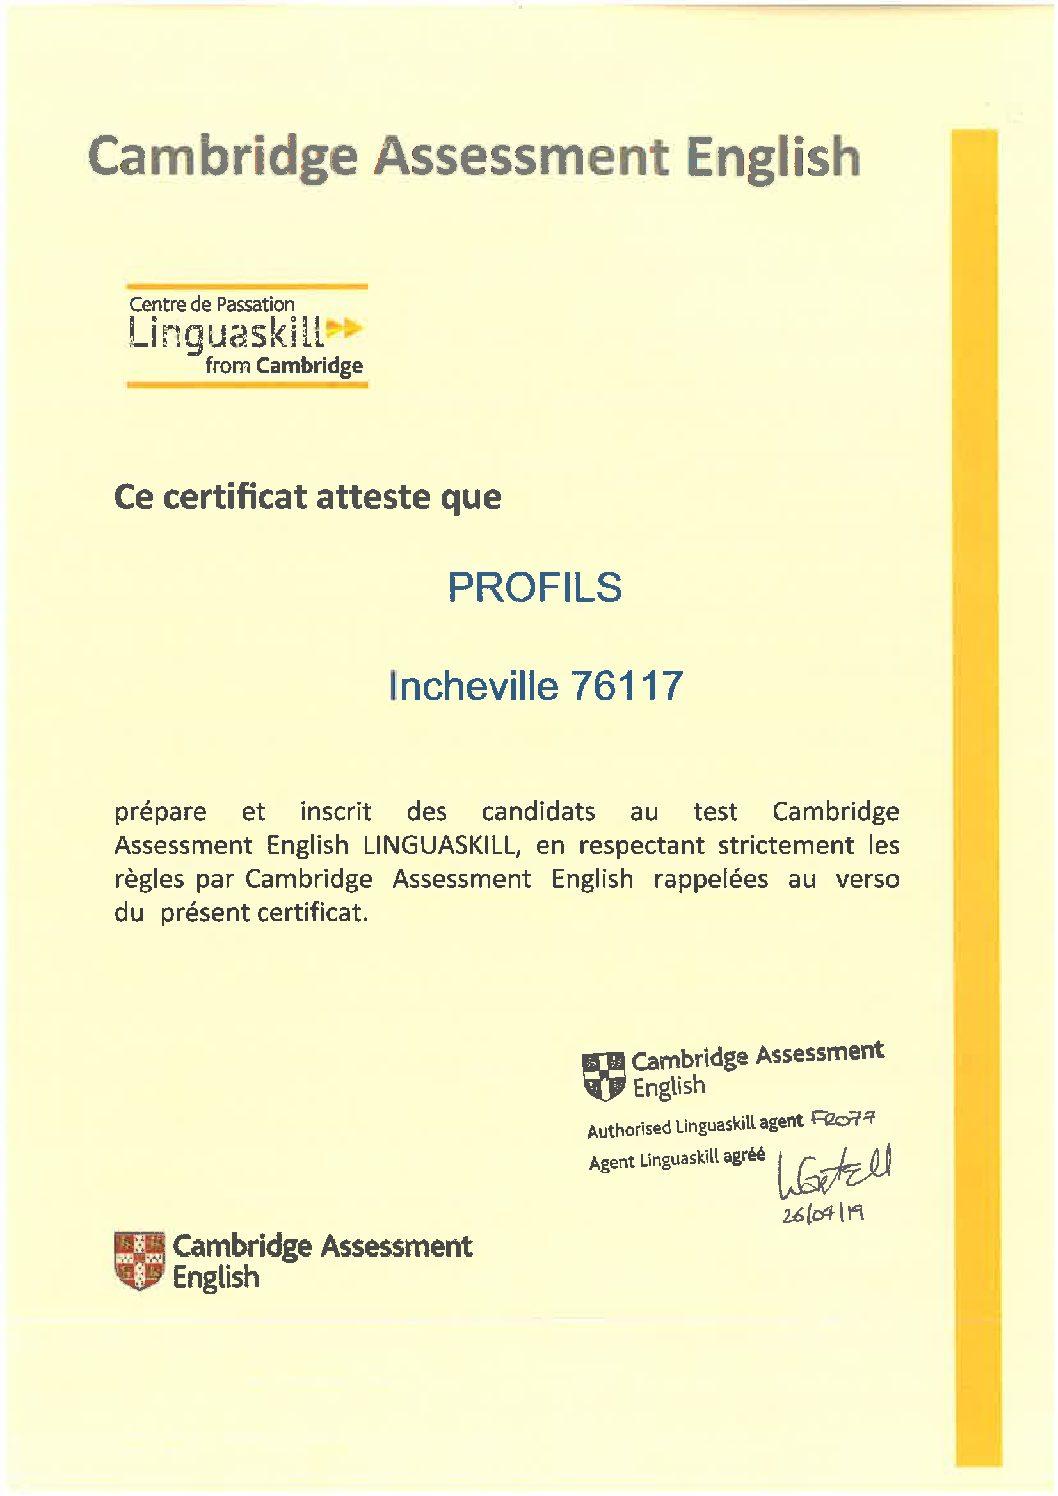 Profils, centre testeur Linguaskill